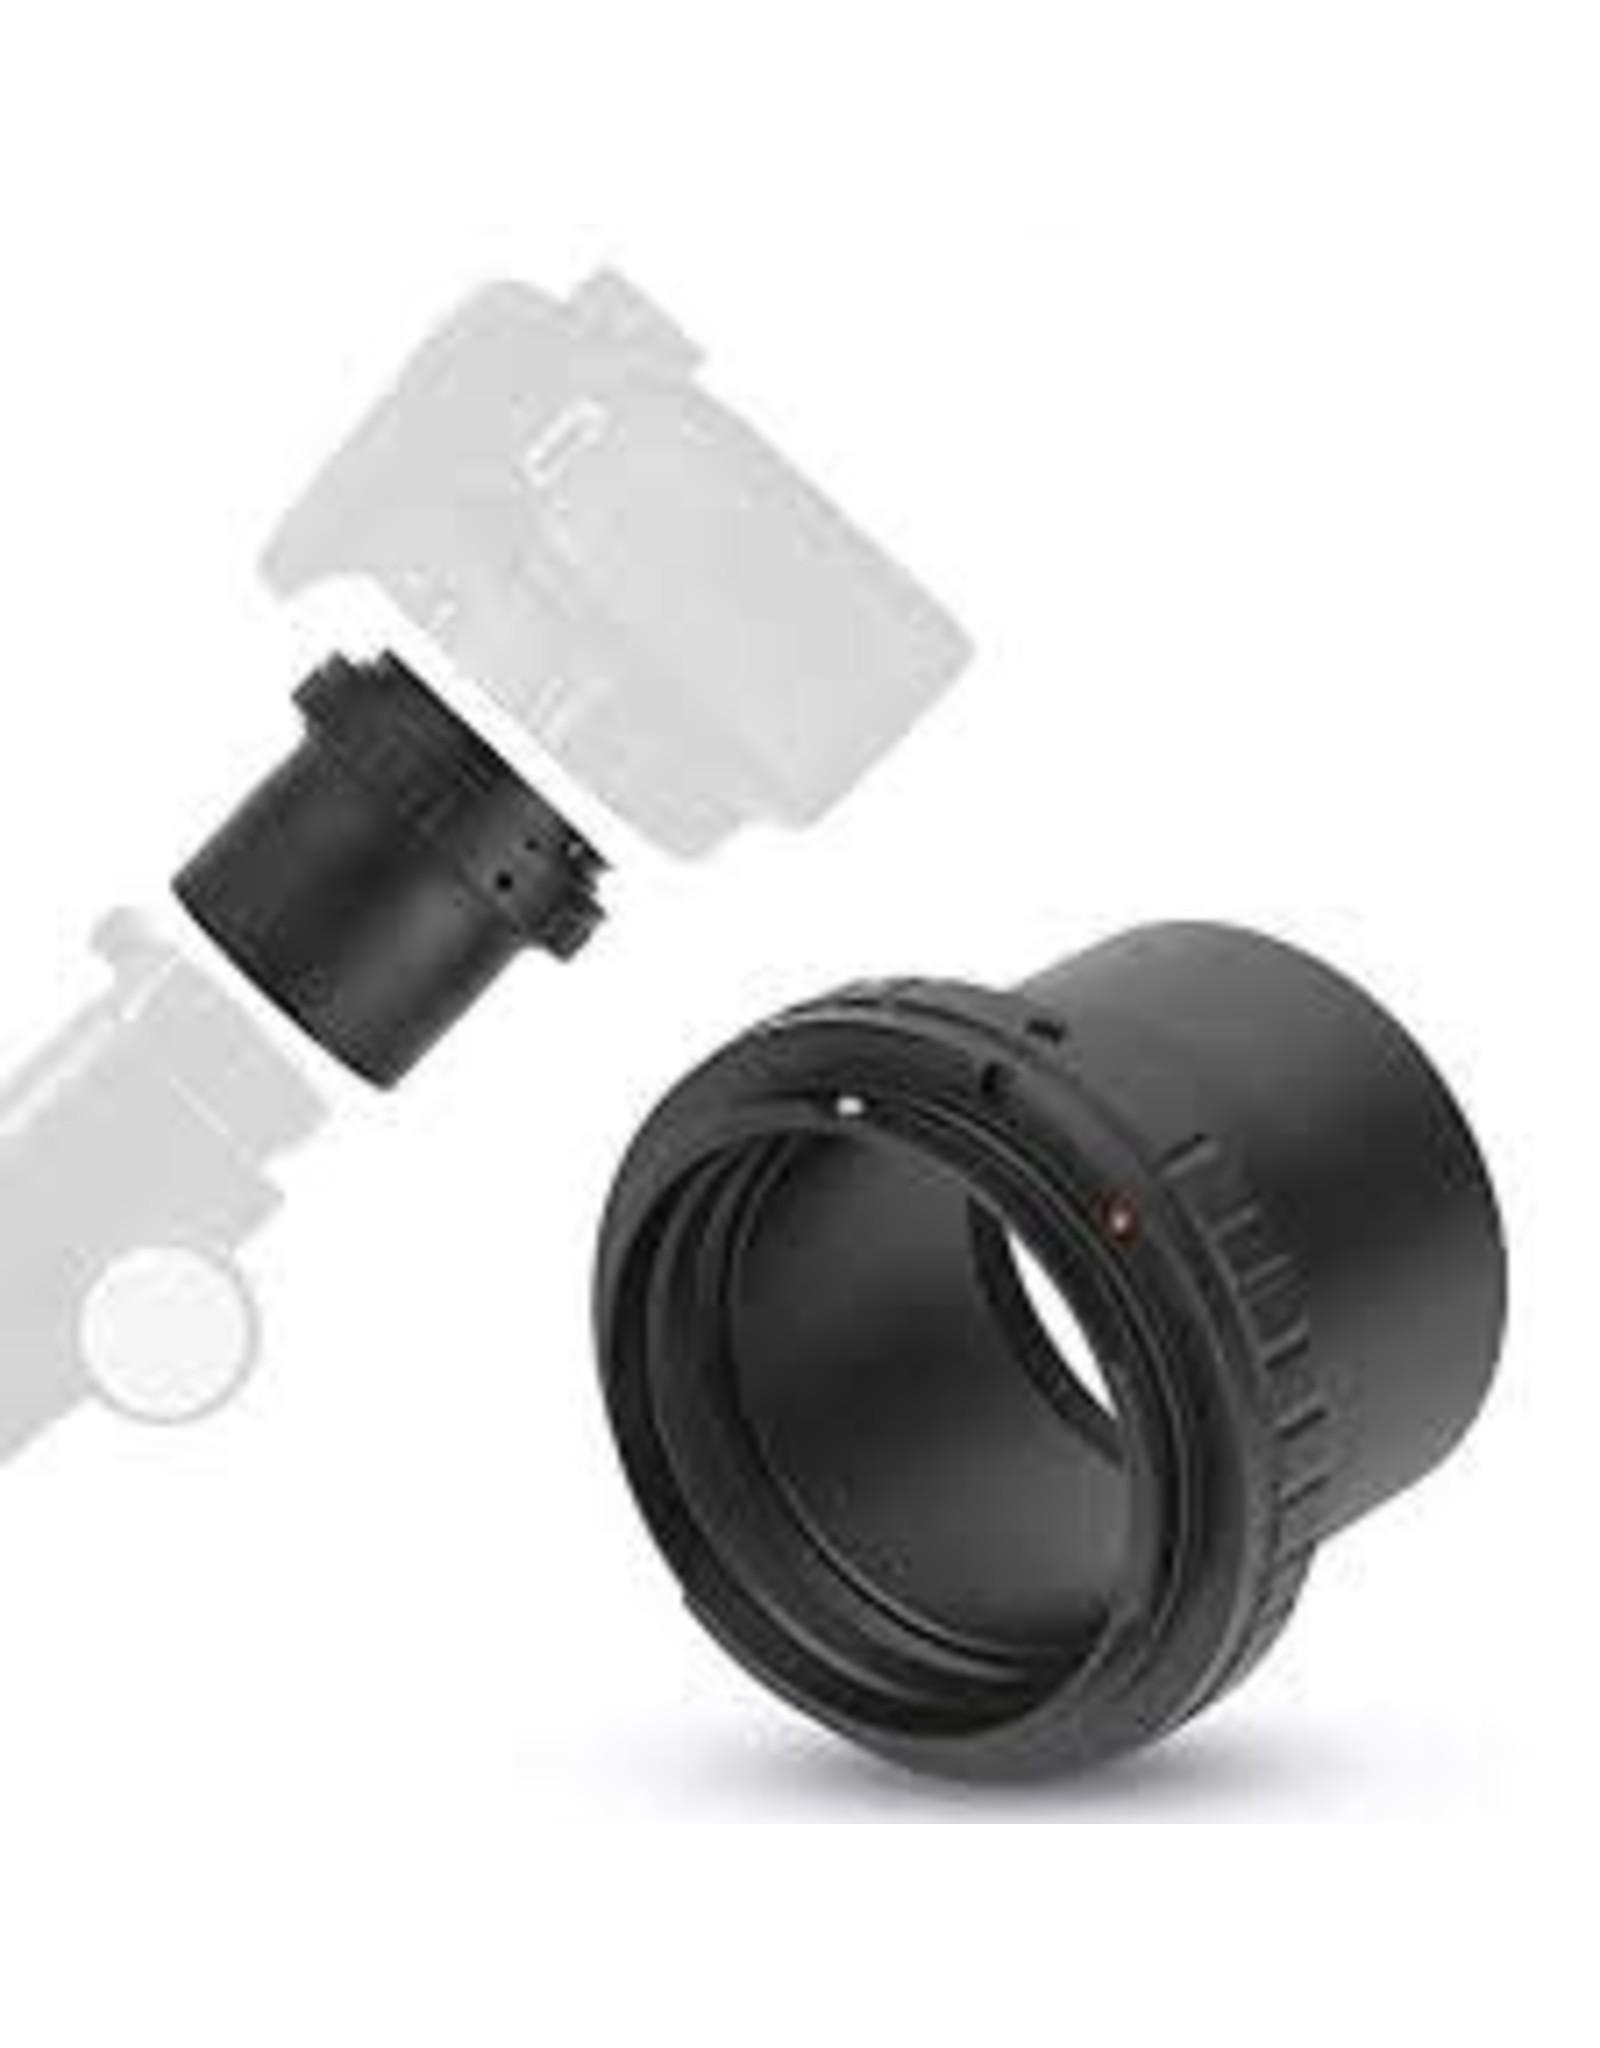 Arcturus M48 2 Inch Camera Adapter